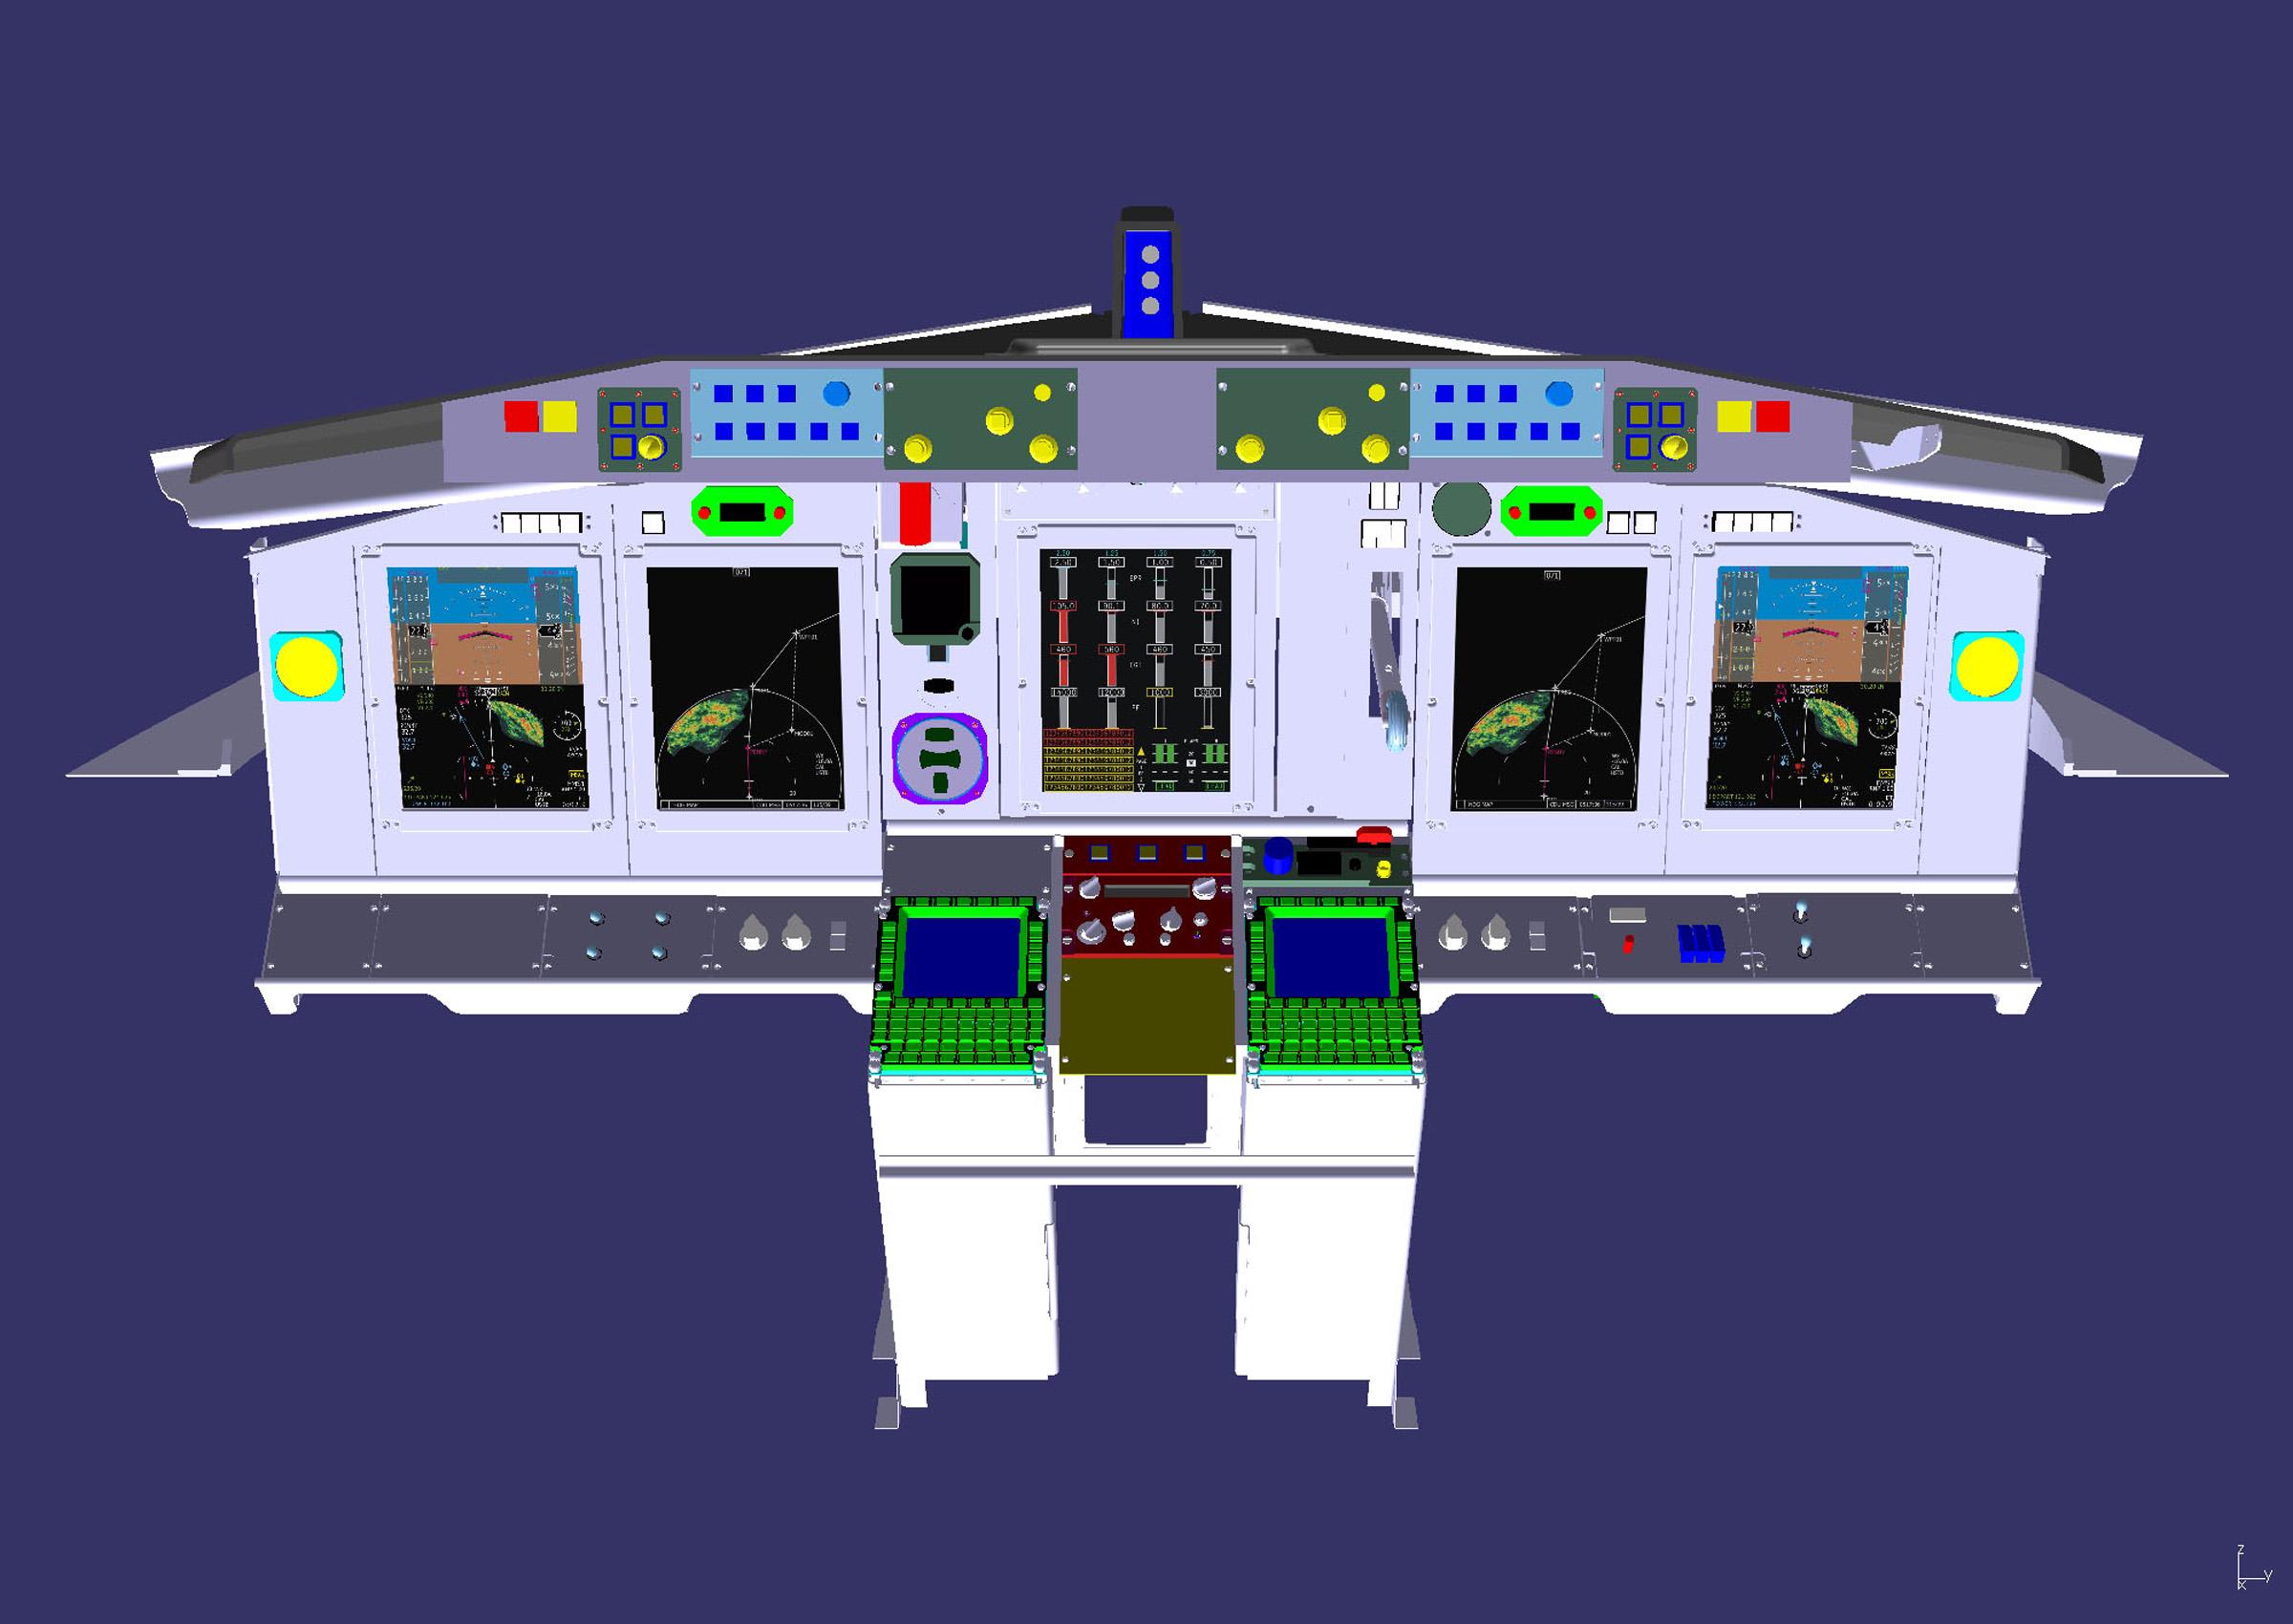 Proposed Upgraded US/NATO AWACS flight deckK65668